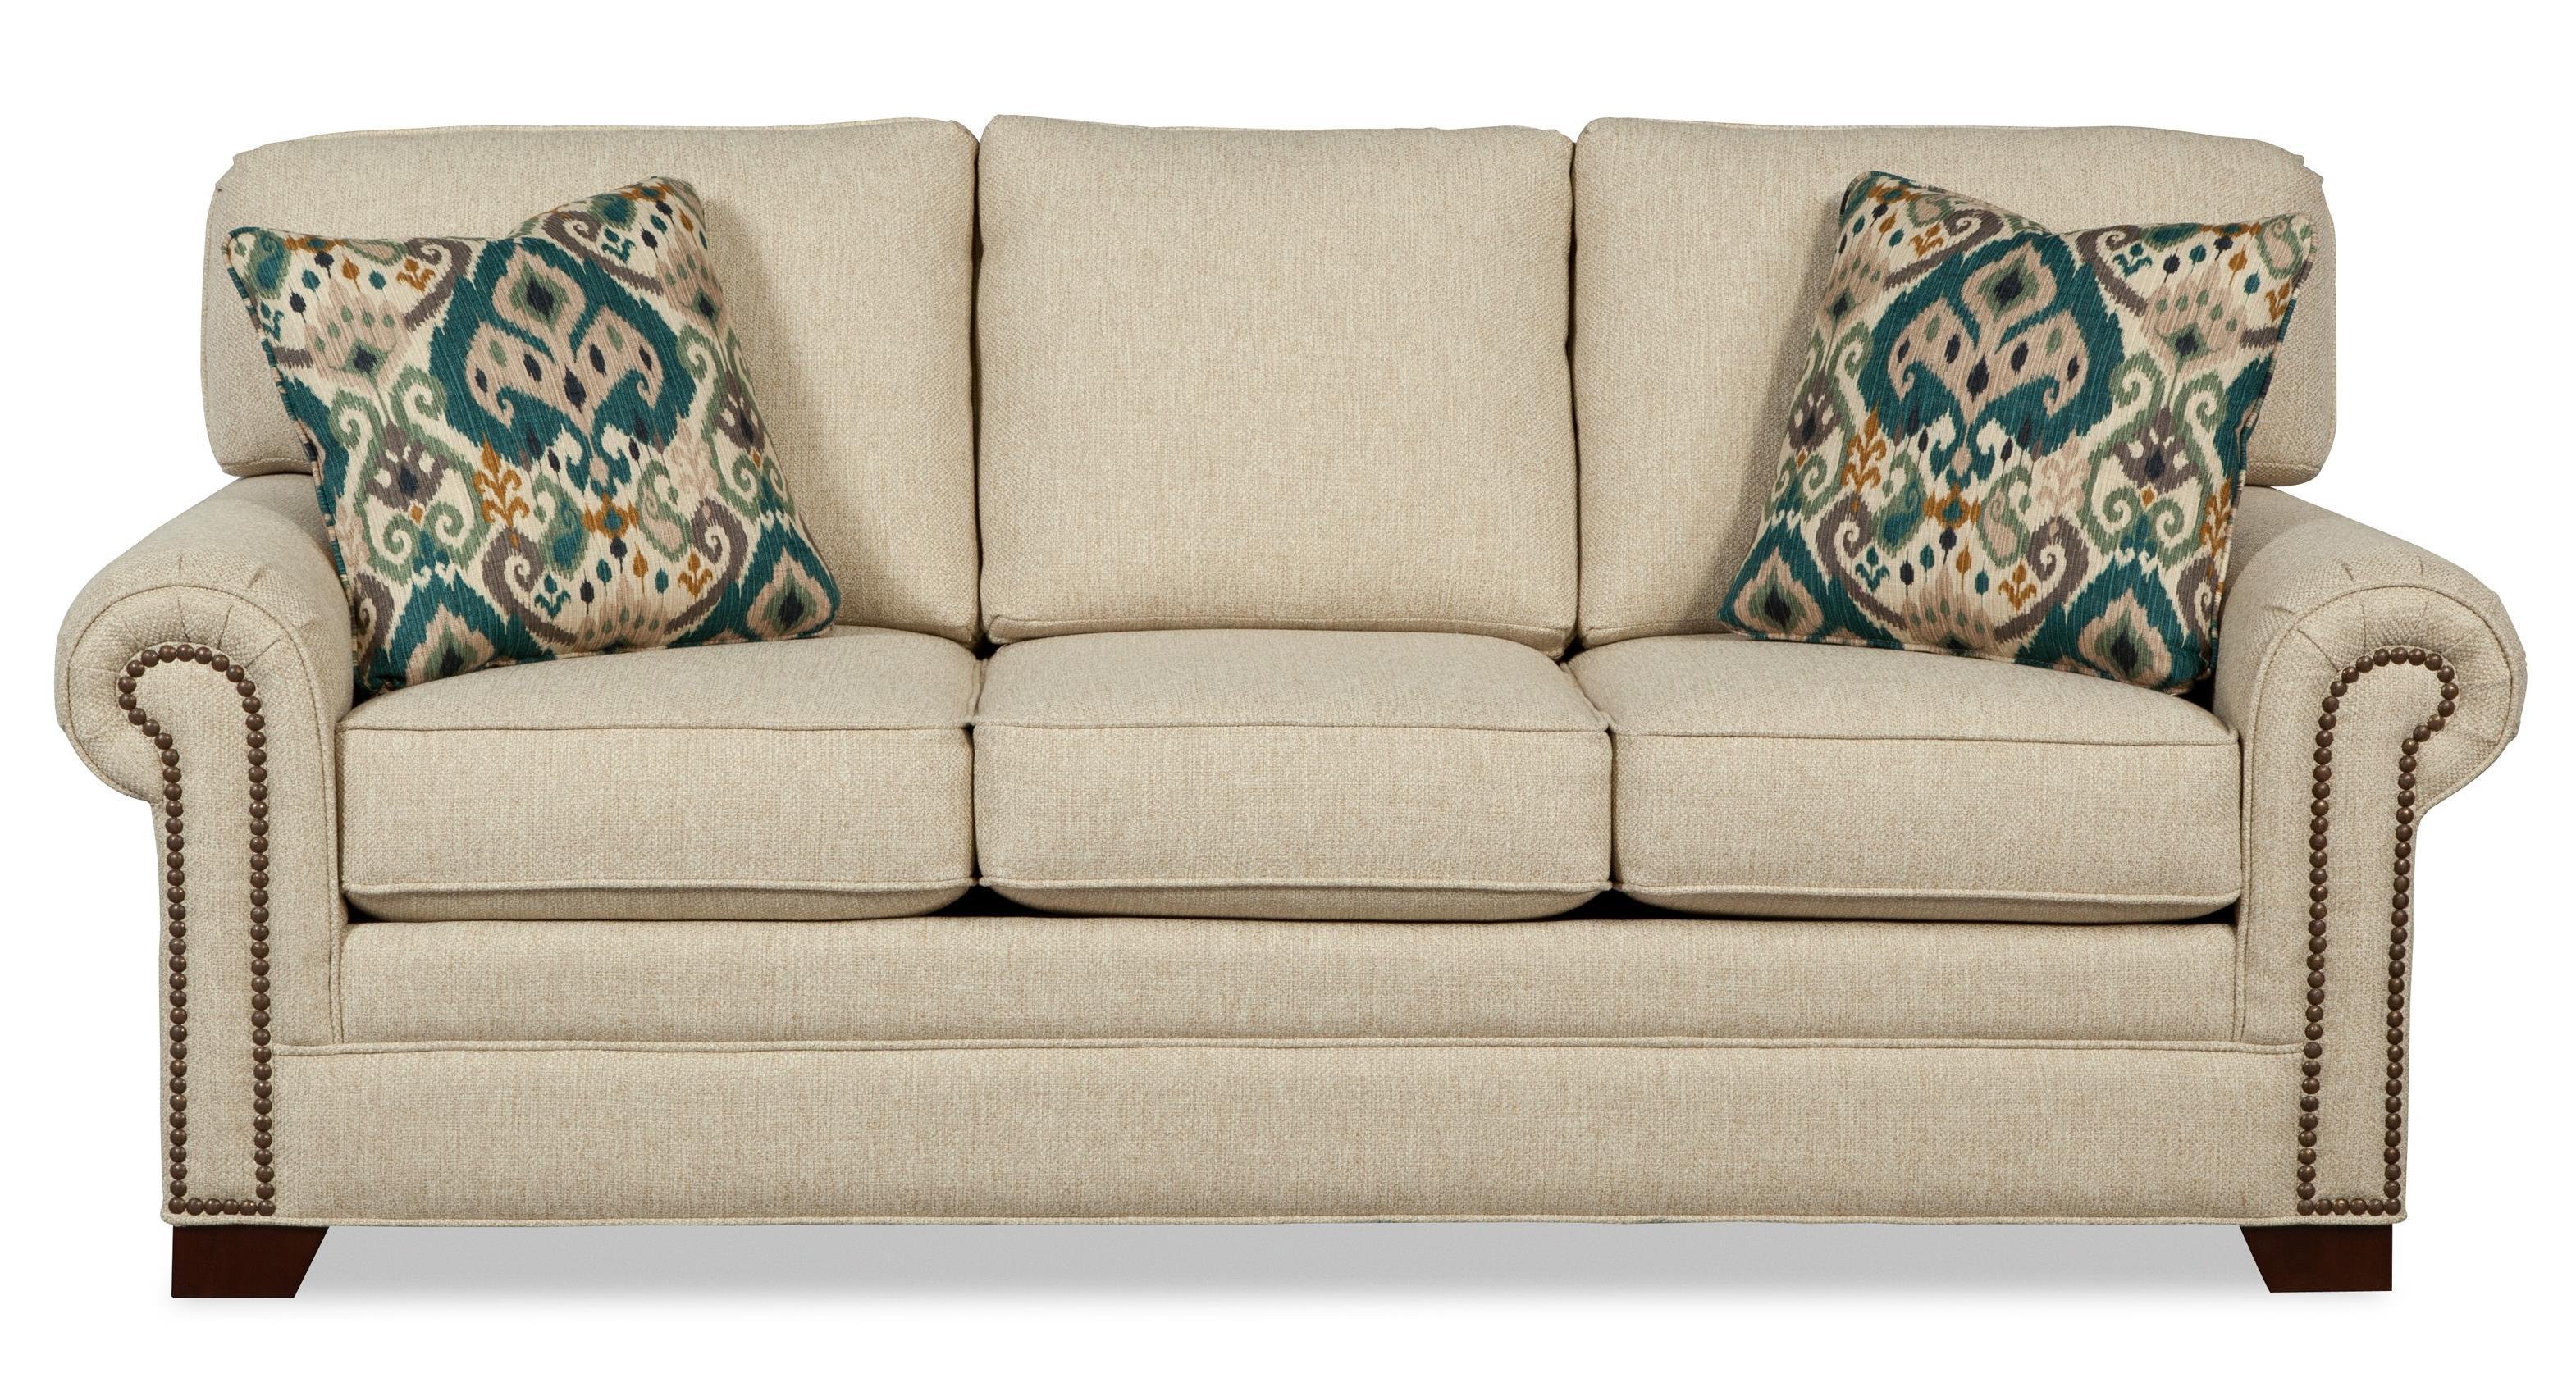 Craftmaster 7565Queen Sleeper Sofa With Memory Foam Mattress ...